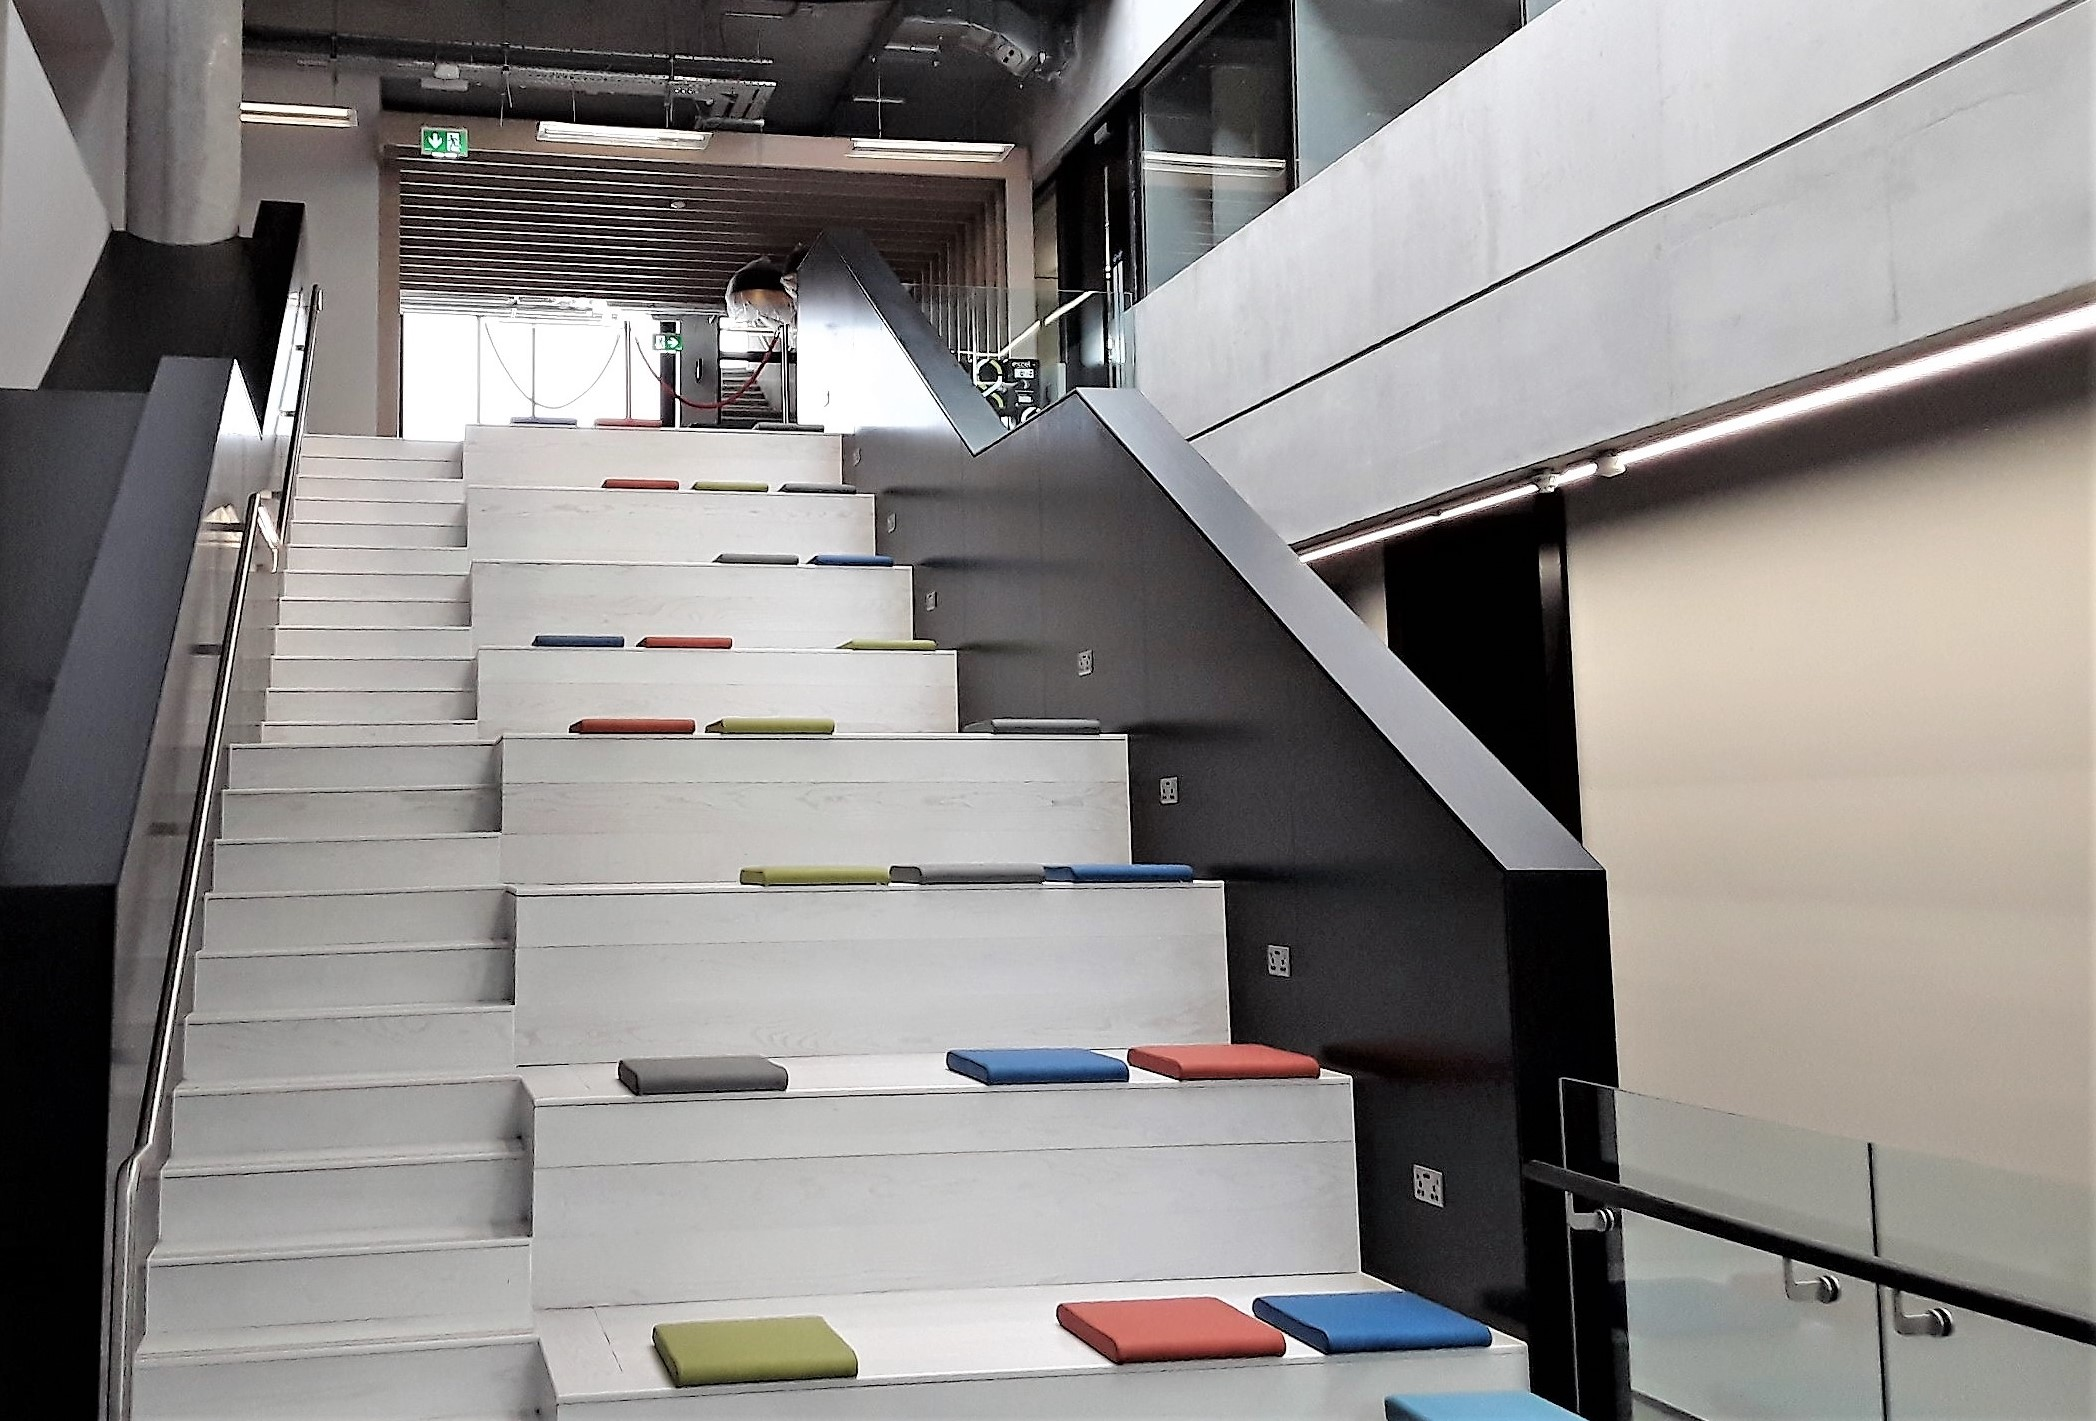 RCSI_Interior_Stairway.jpg